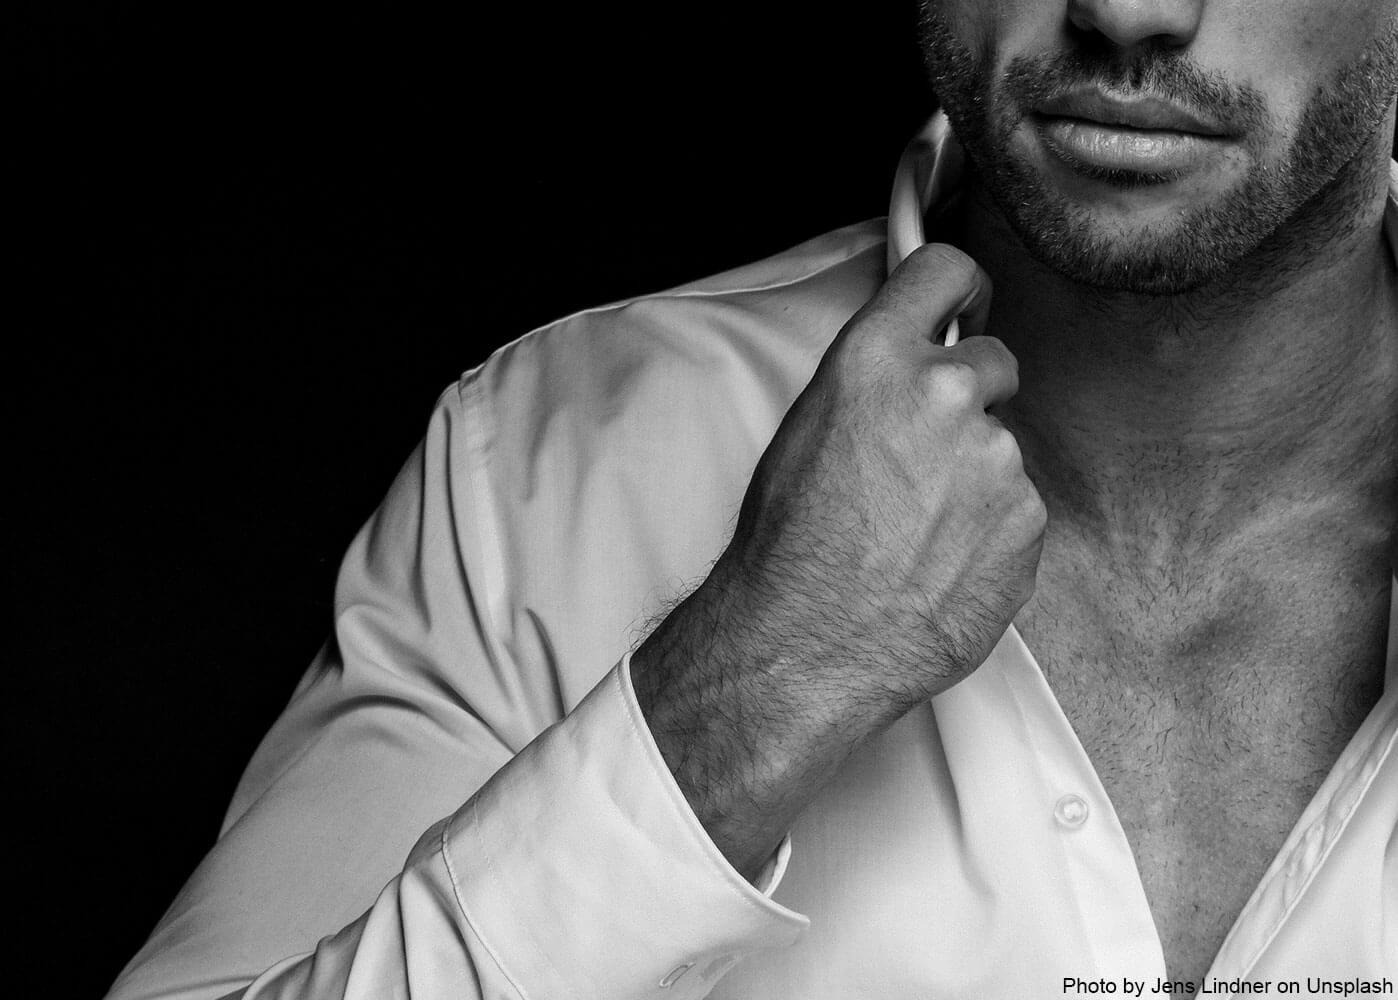 Sarankan Pasangan Pakai Deodorant Nivea untuk Menuntaskan Masalah Bau Badan